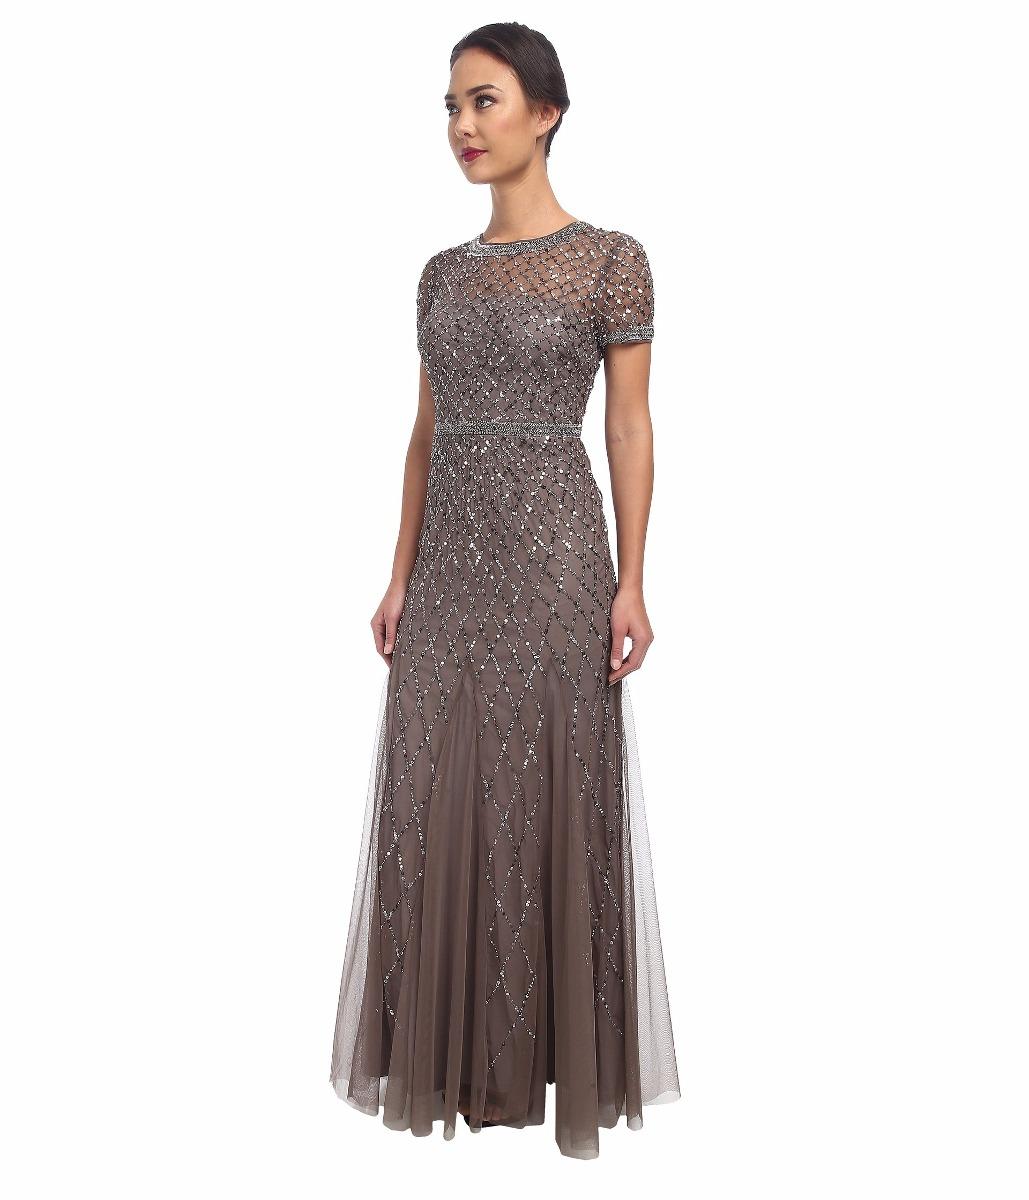 45f4777ad vestido adrianna papell modelo mansur talla 4 noche de rio. Cargando zoom.